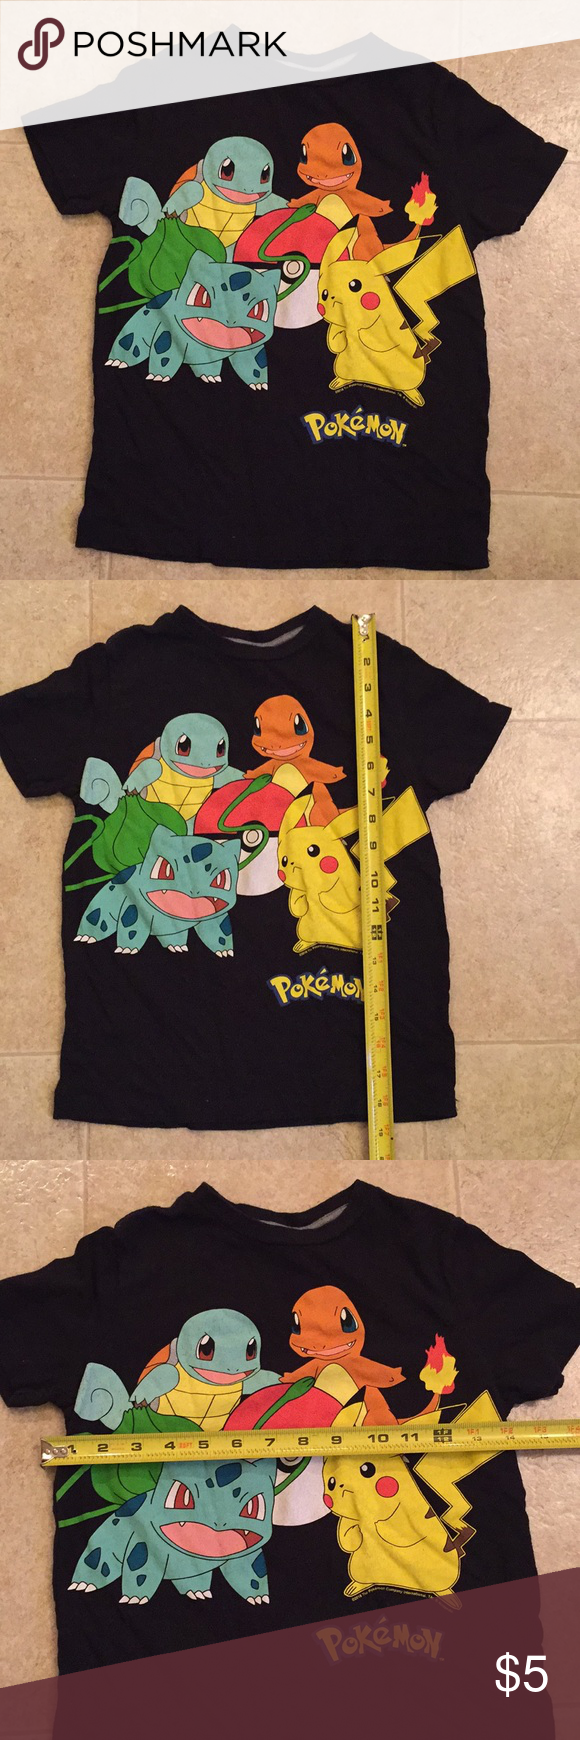 4d27b28b Pokémon T-shirt Pokémon T-shirt Old Navy Shirts & Tops Tees - Short Sleeve